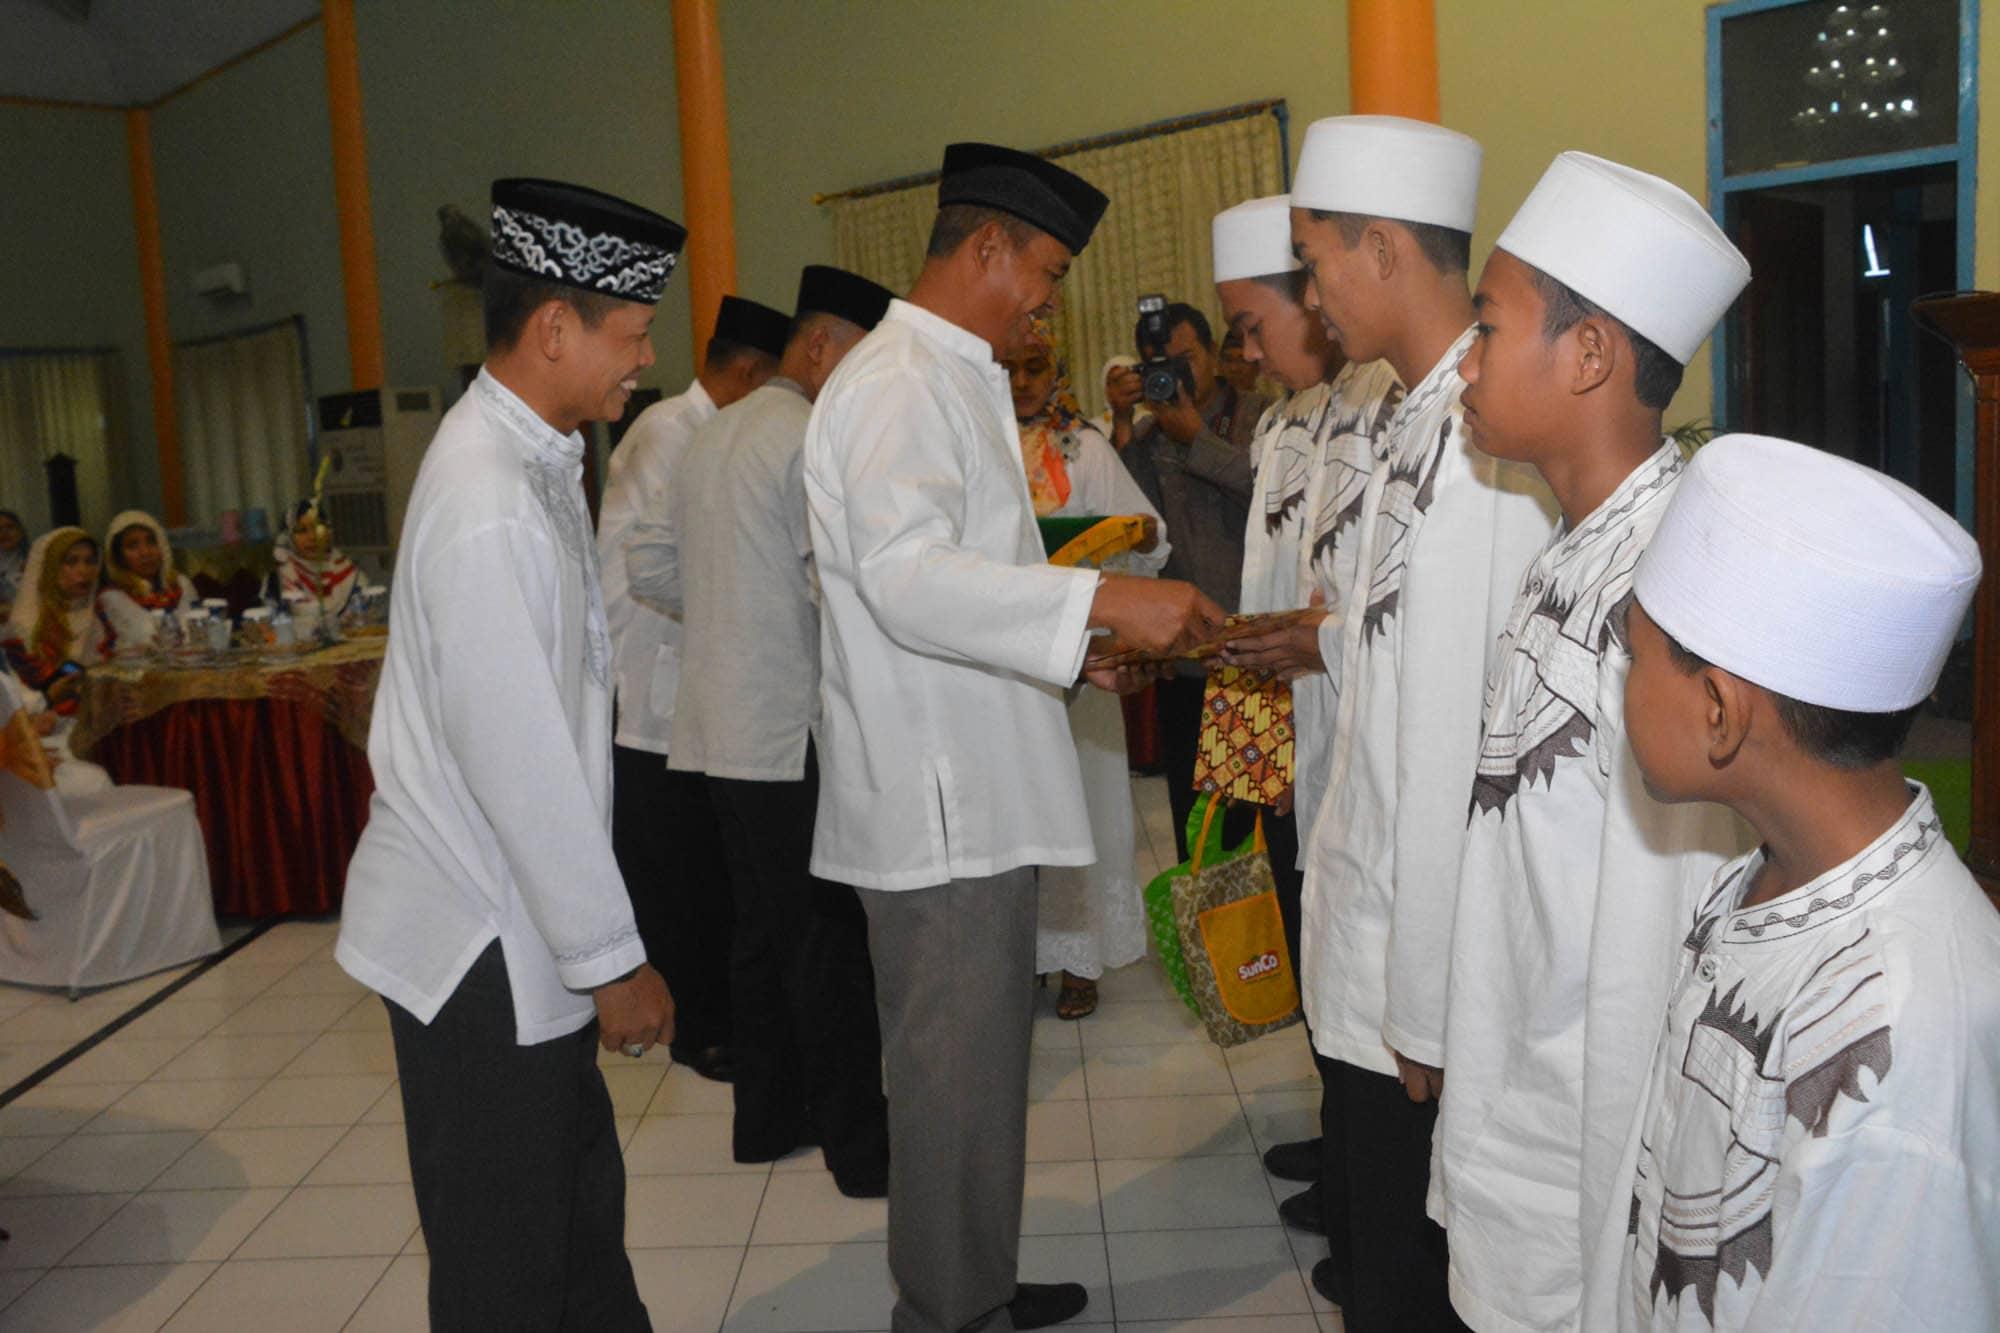 Pangdam Buka Puasa Bersama Warga Korem 084/Bj